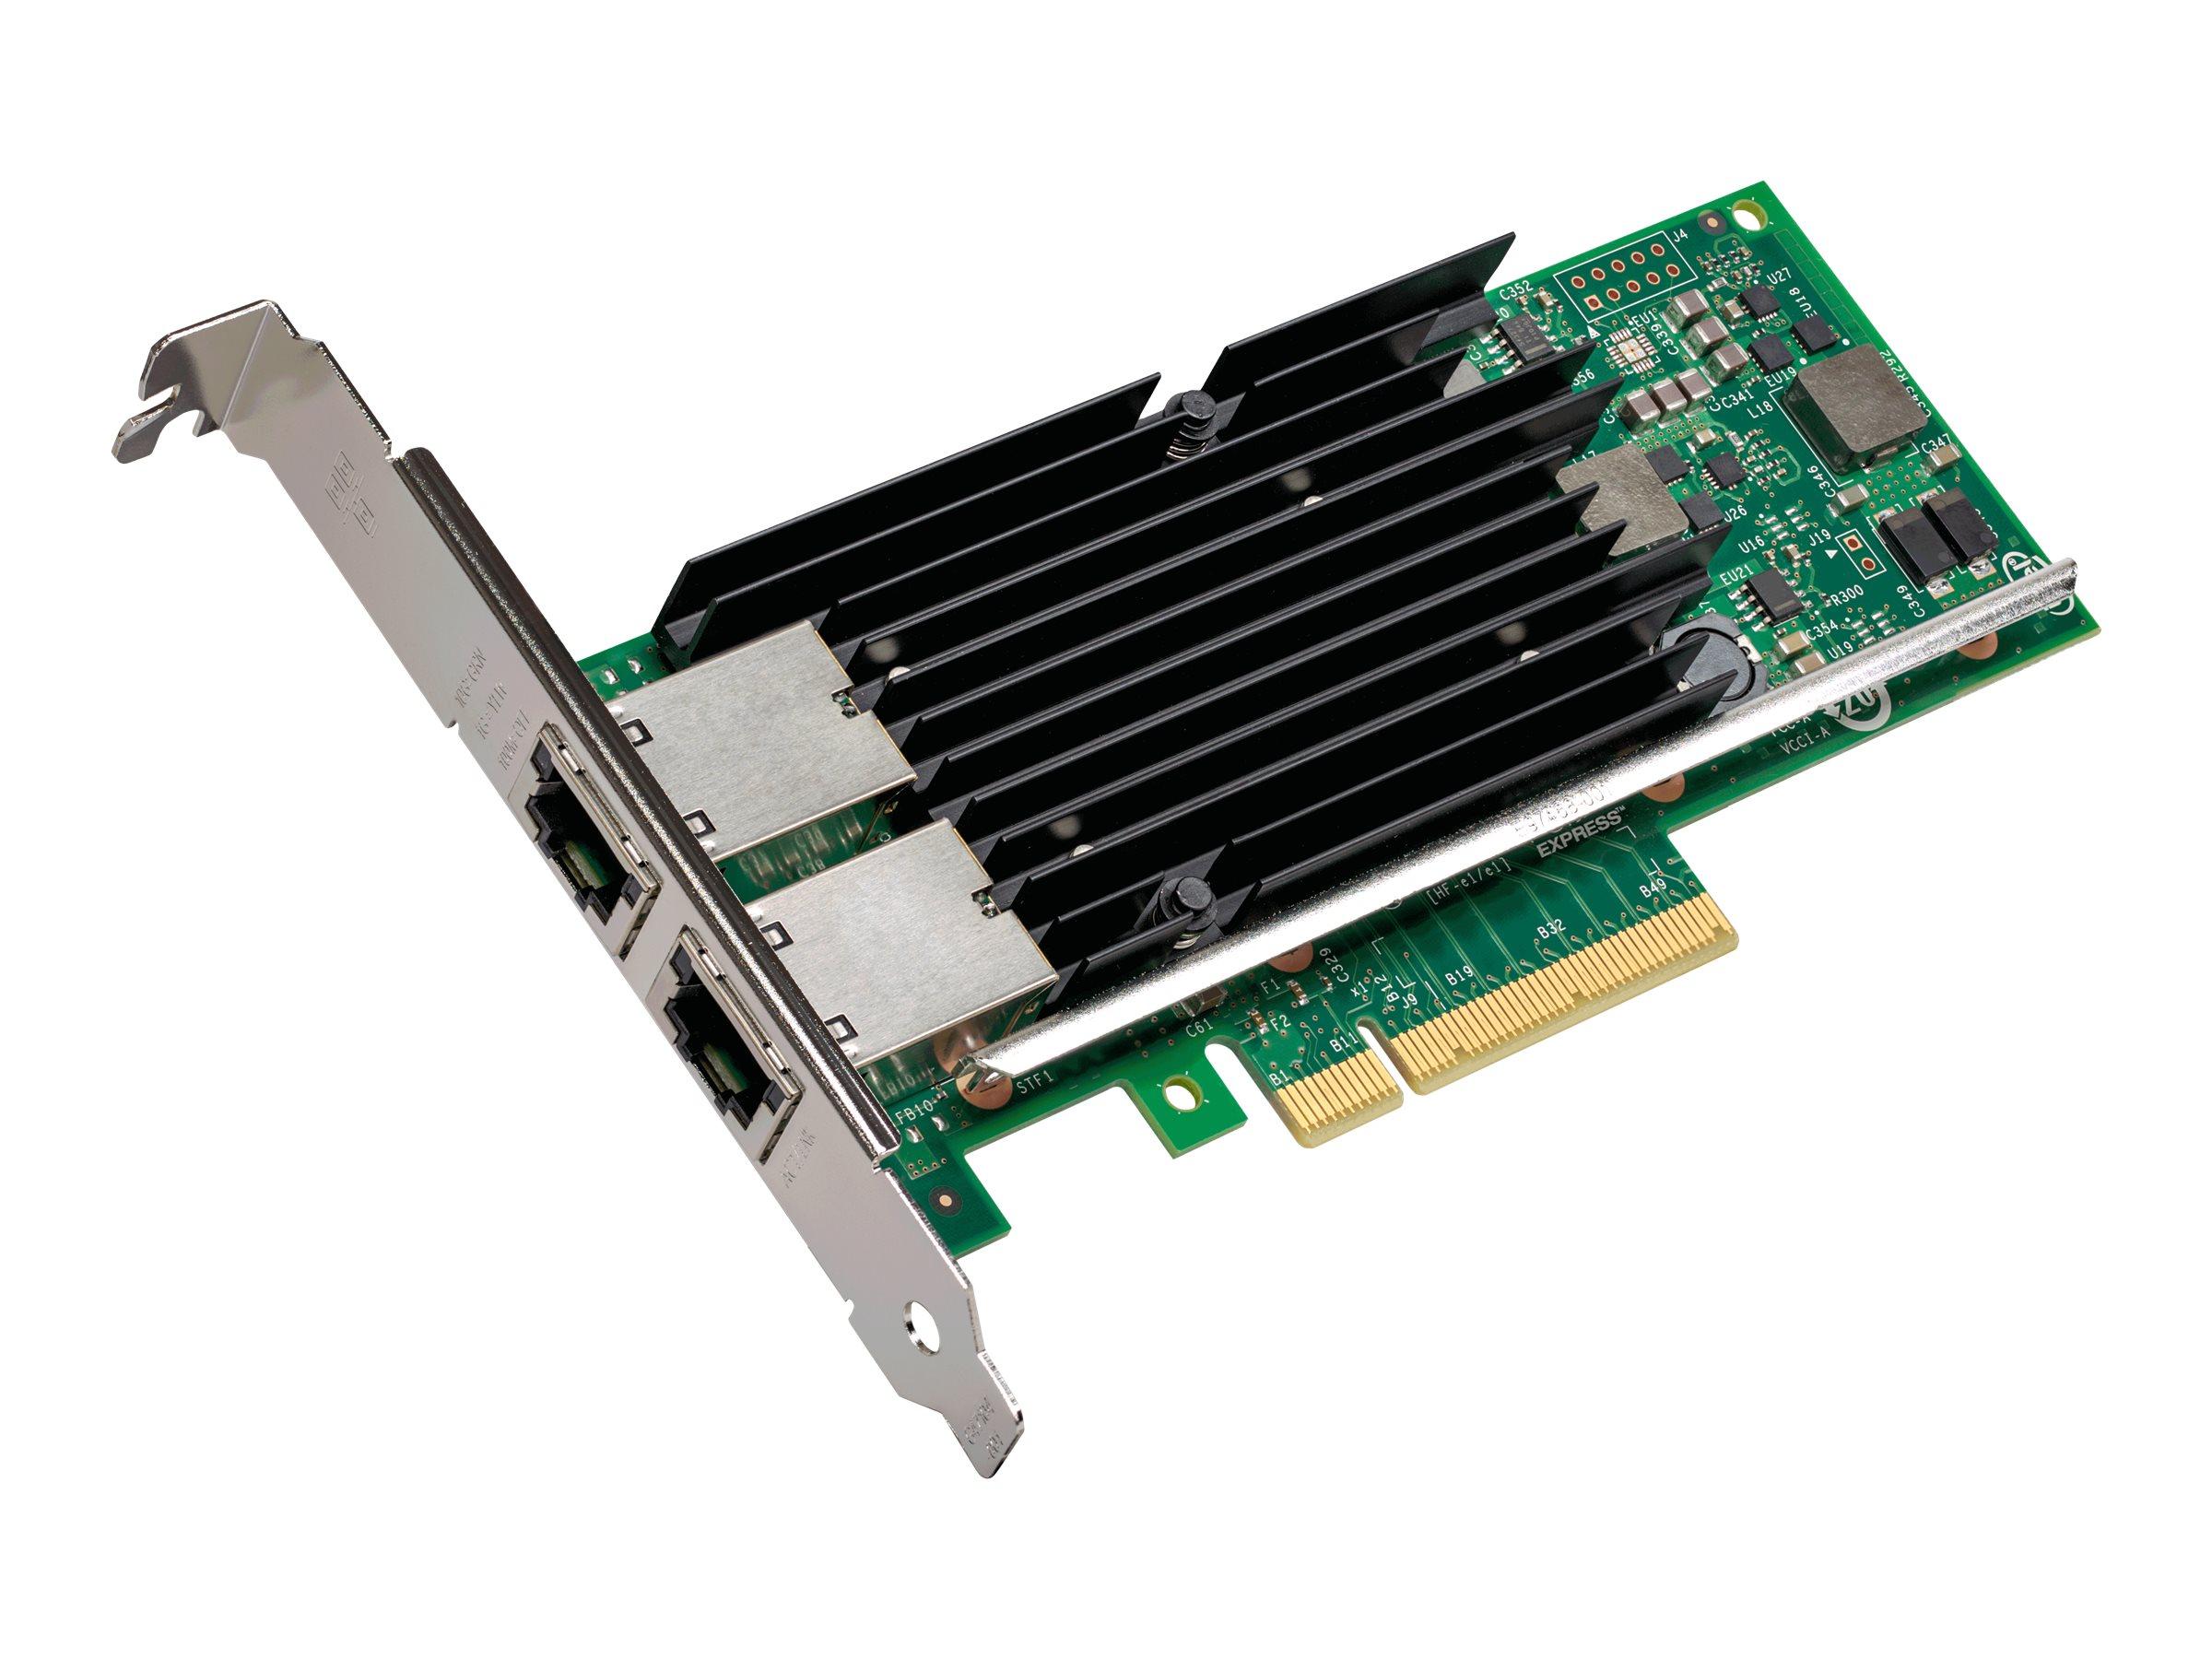 Intel Ethernet Converged Network Adapter X540-T2 - Netzwerkadapter - PCIe 2.1 x8 Low-Profile - 10Gb Ethernet x 2